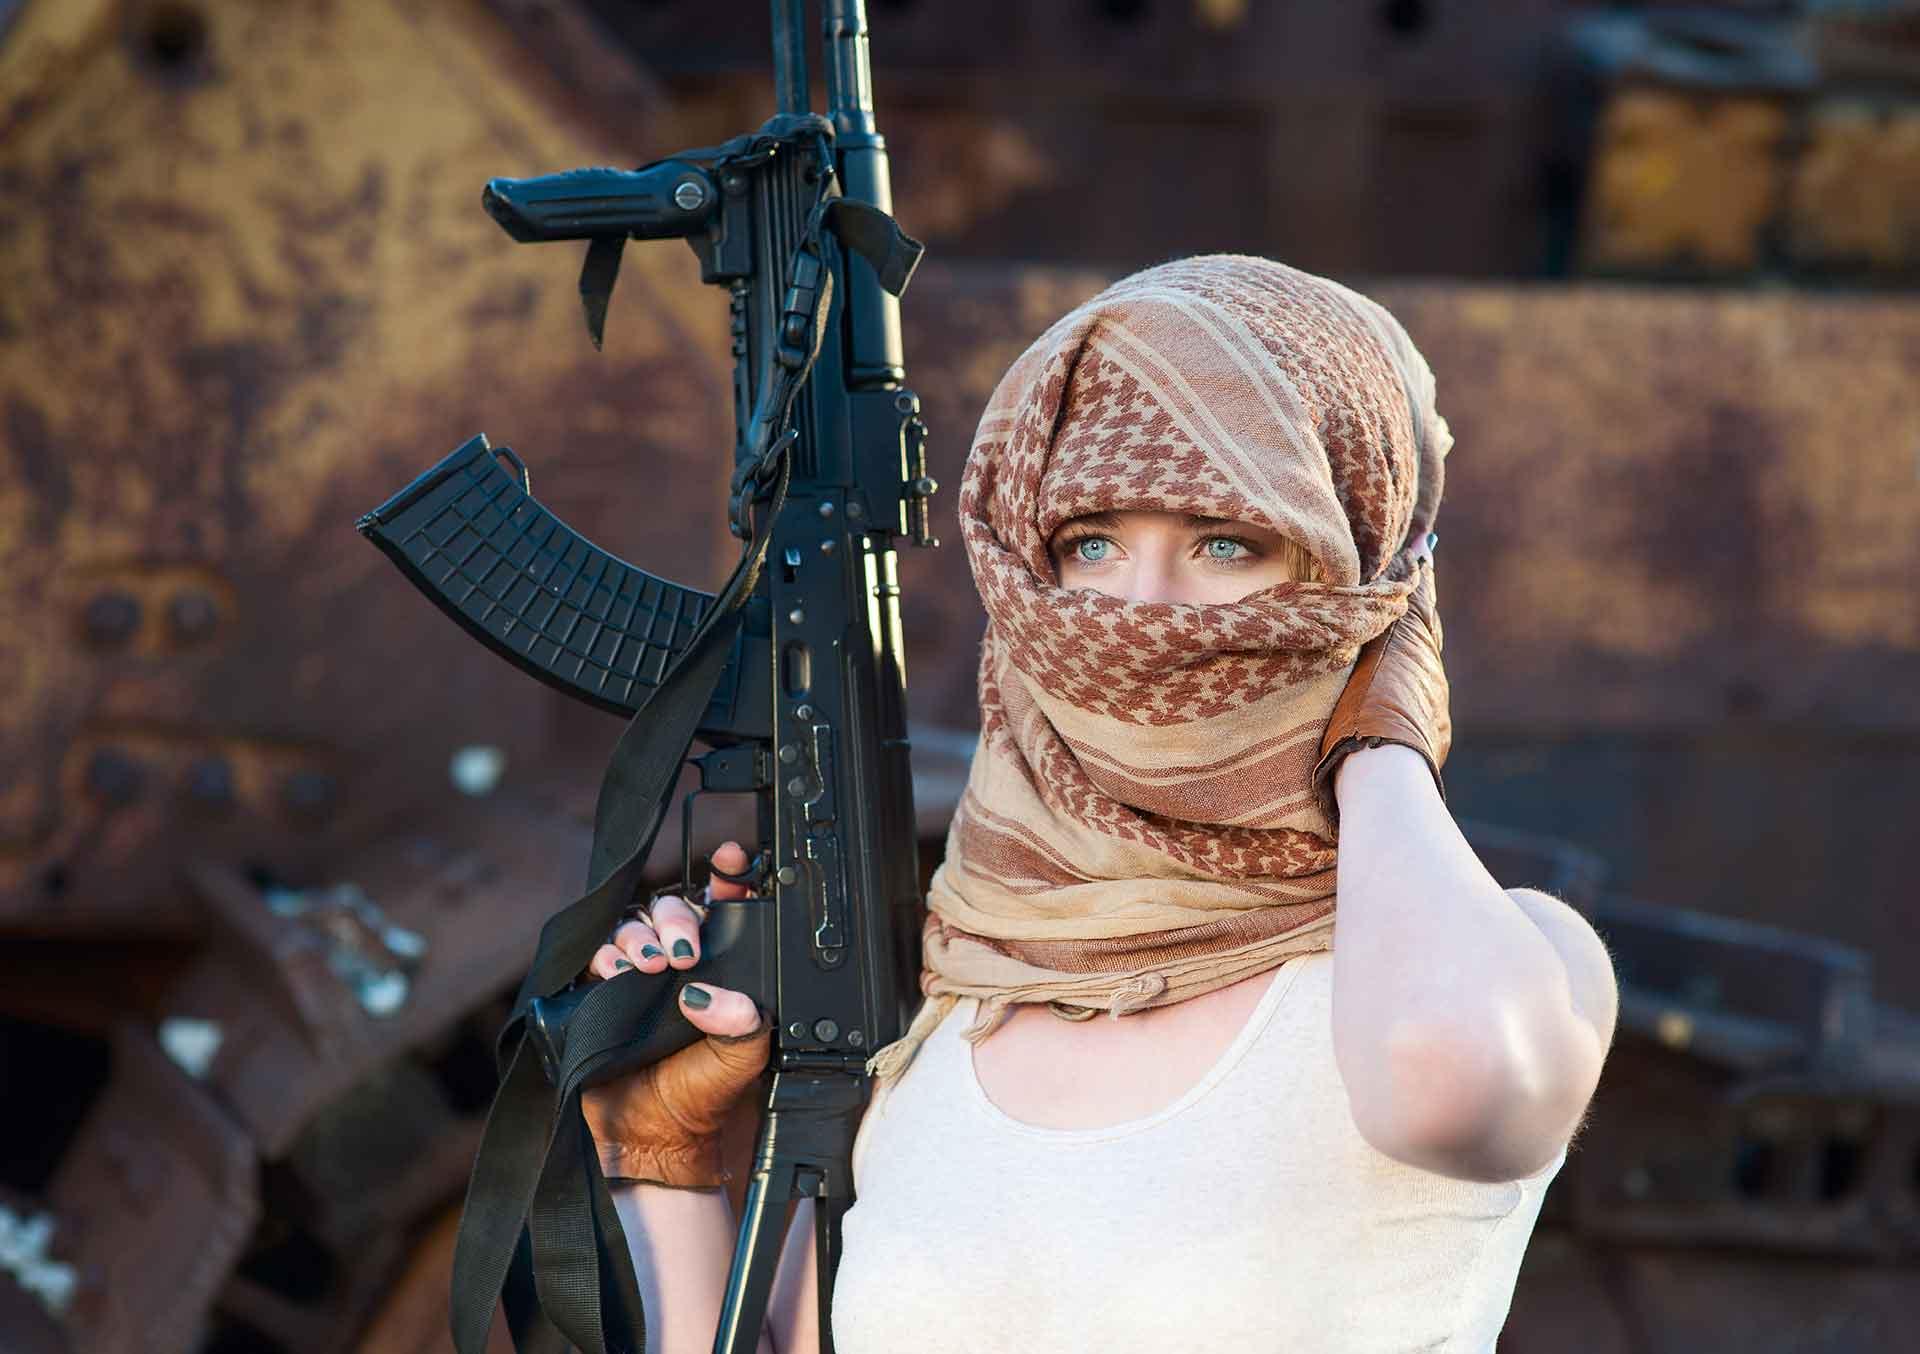 Spraakmakende strafzaken - Maastrichtse jihadbruid